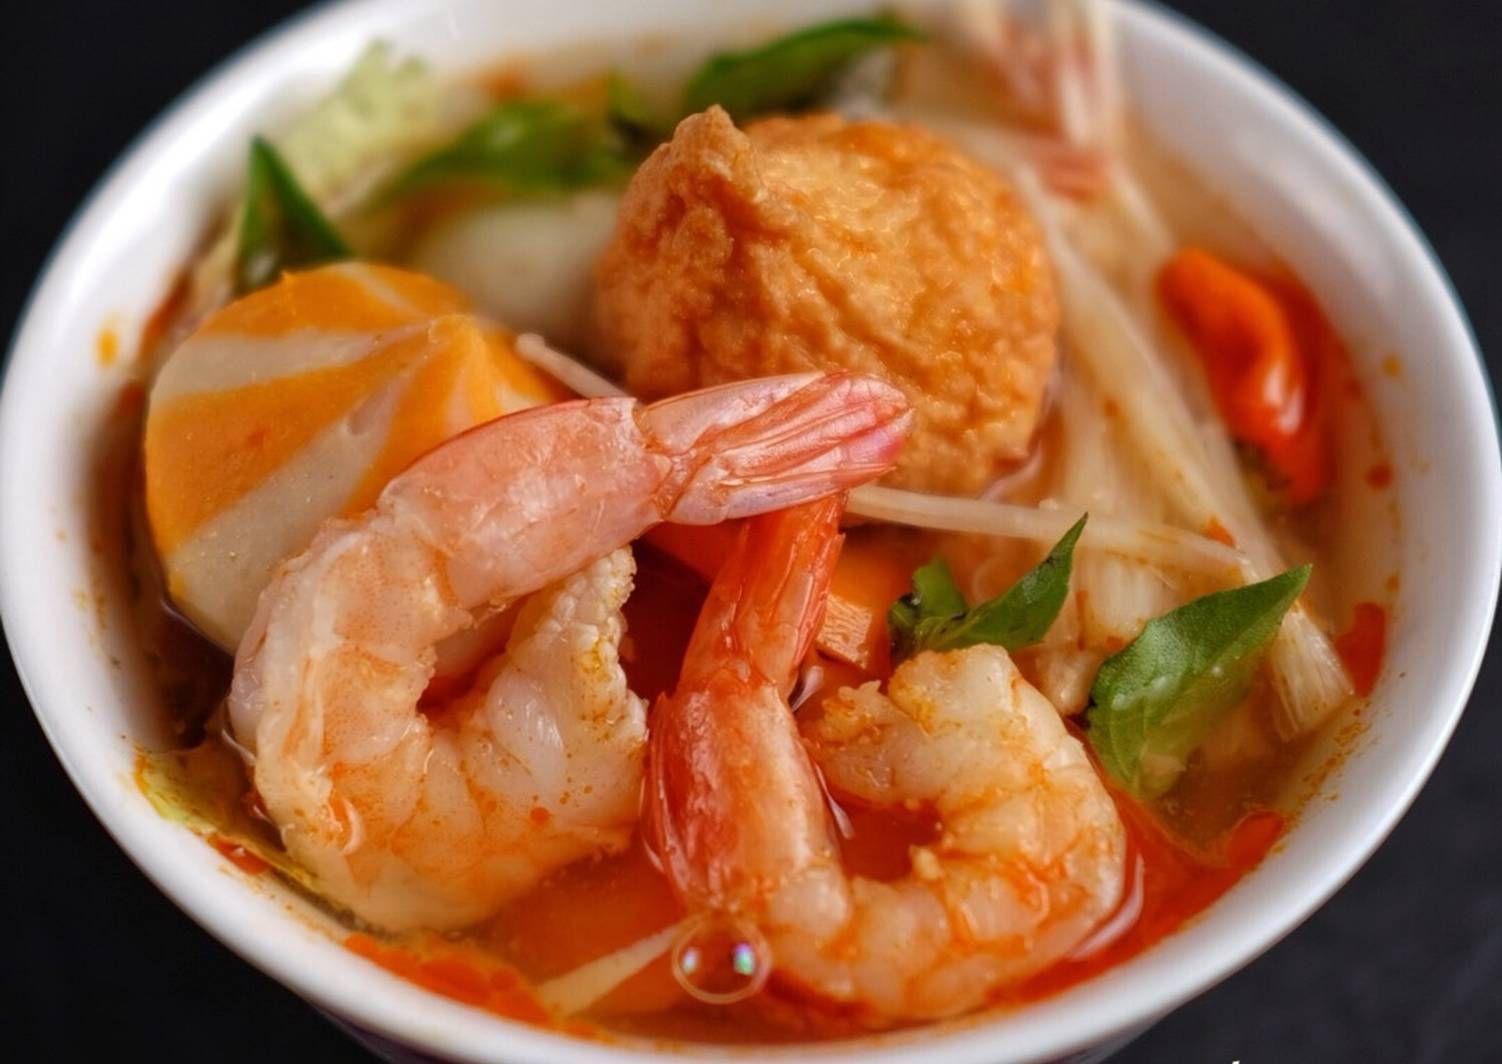 Resep Sup Tomyum Pedas Oleh Susi Agung Resep Resep Sup Resep Masakan Indonesia Resep